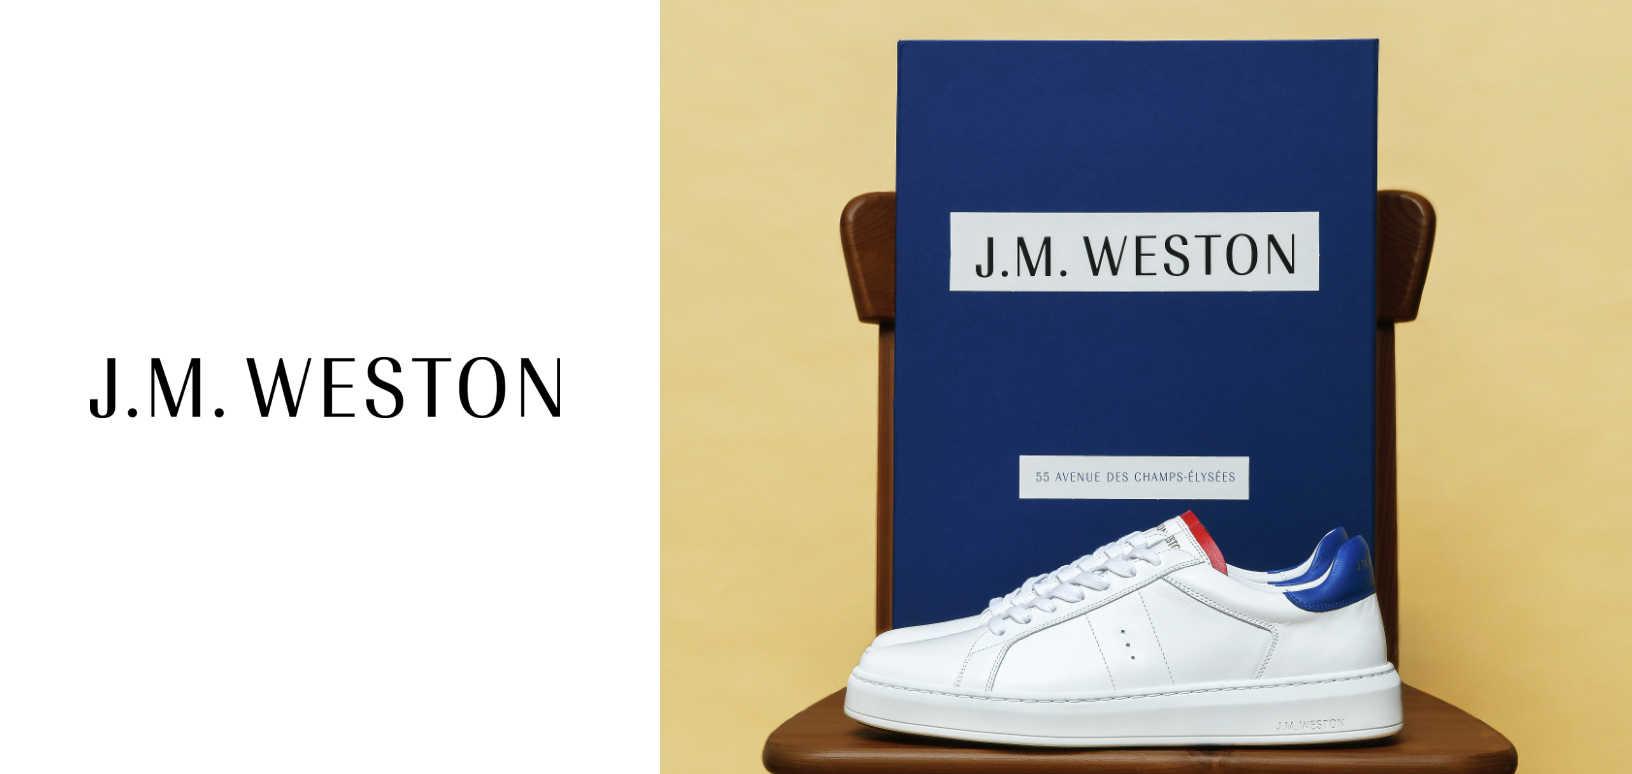 J.M. WESTON